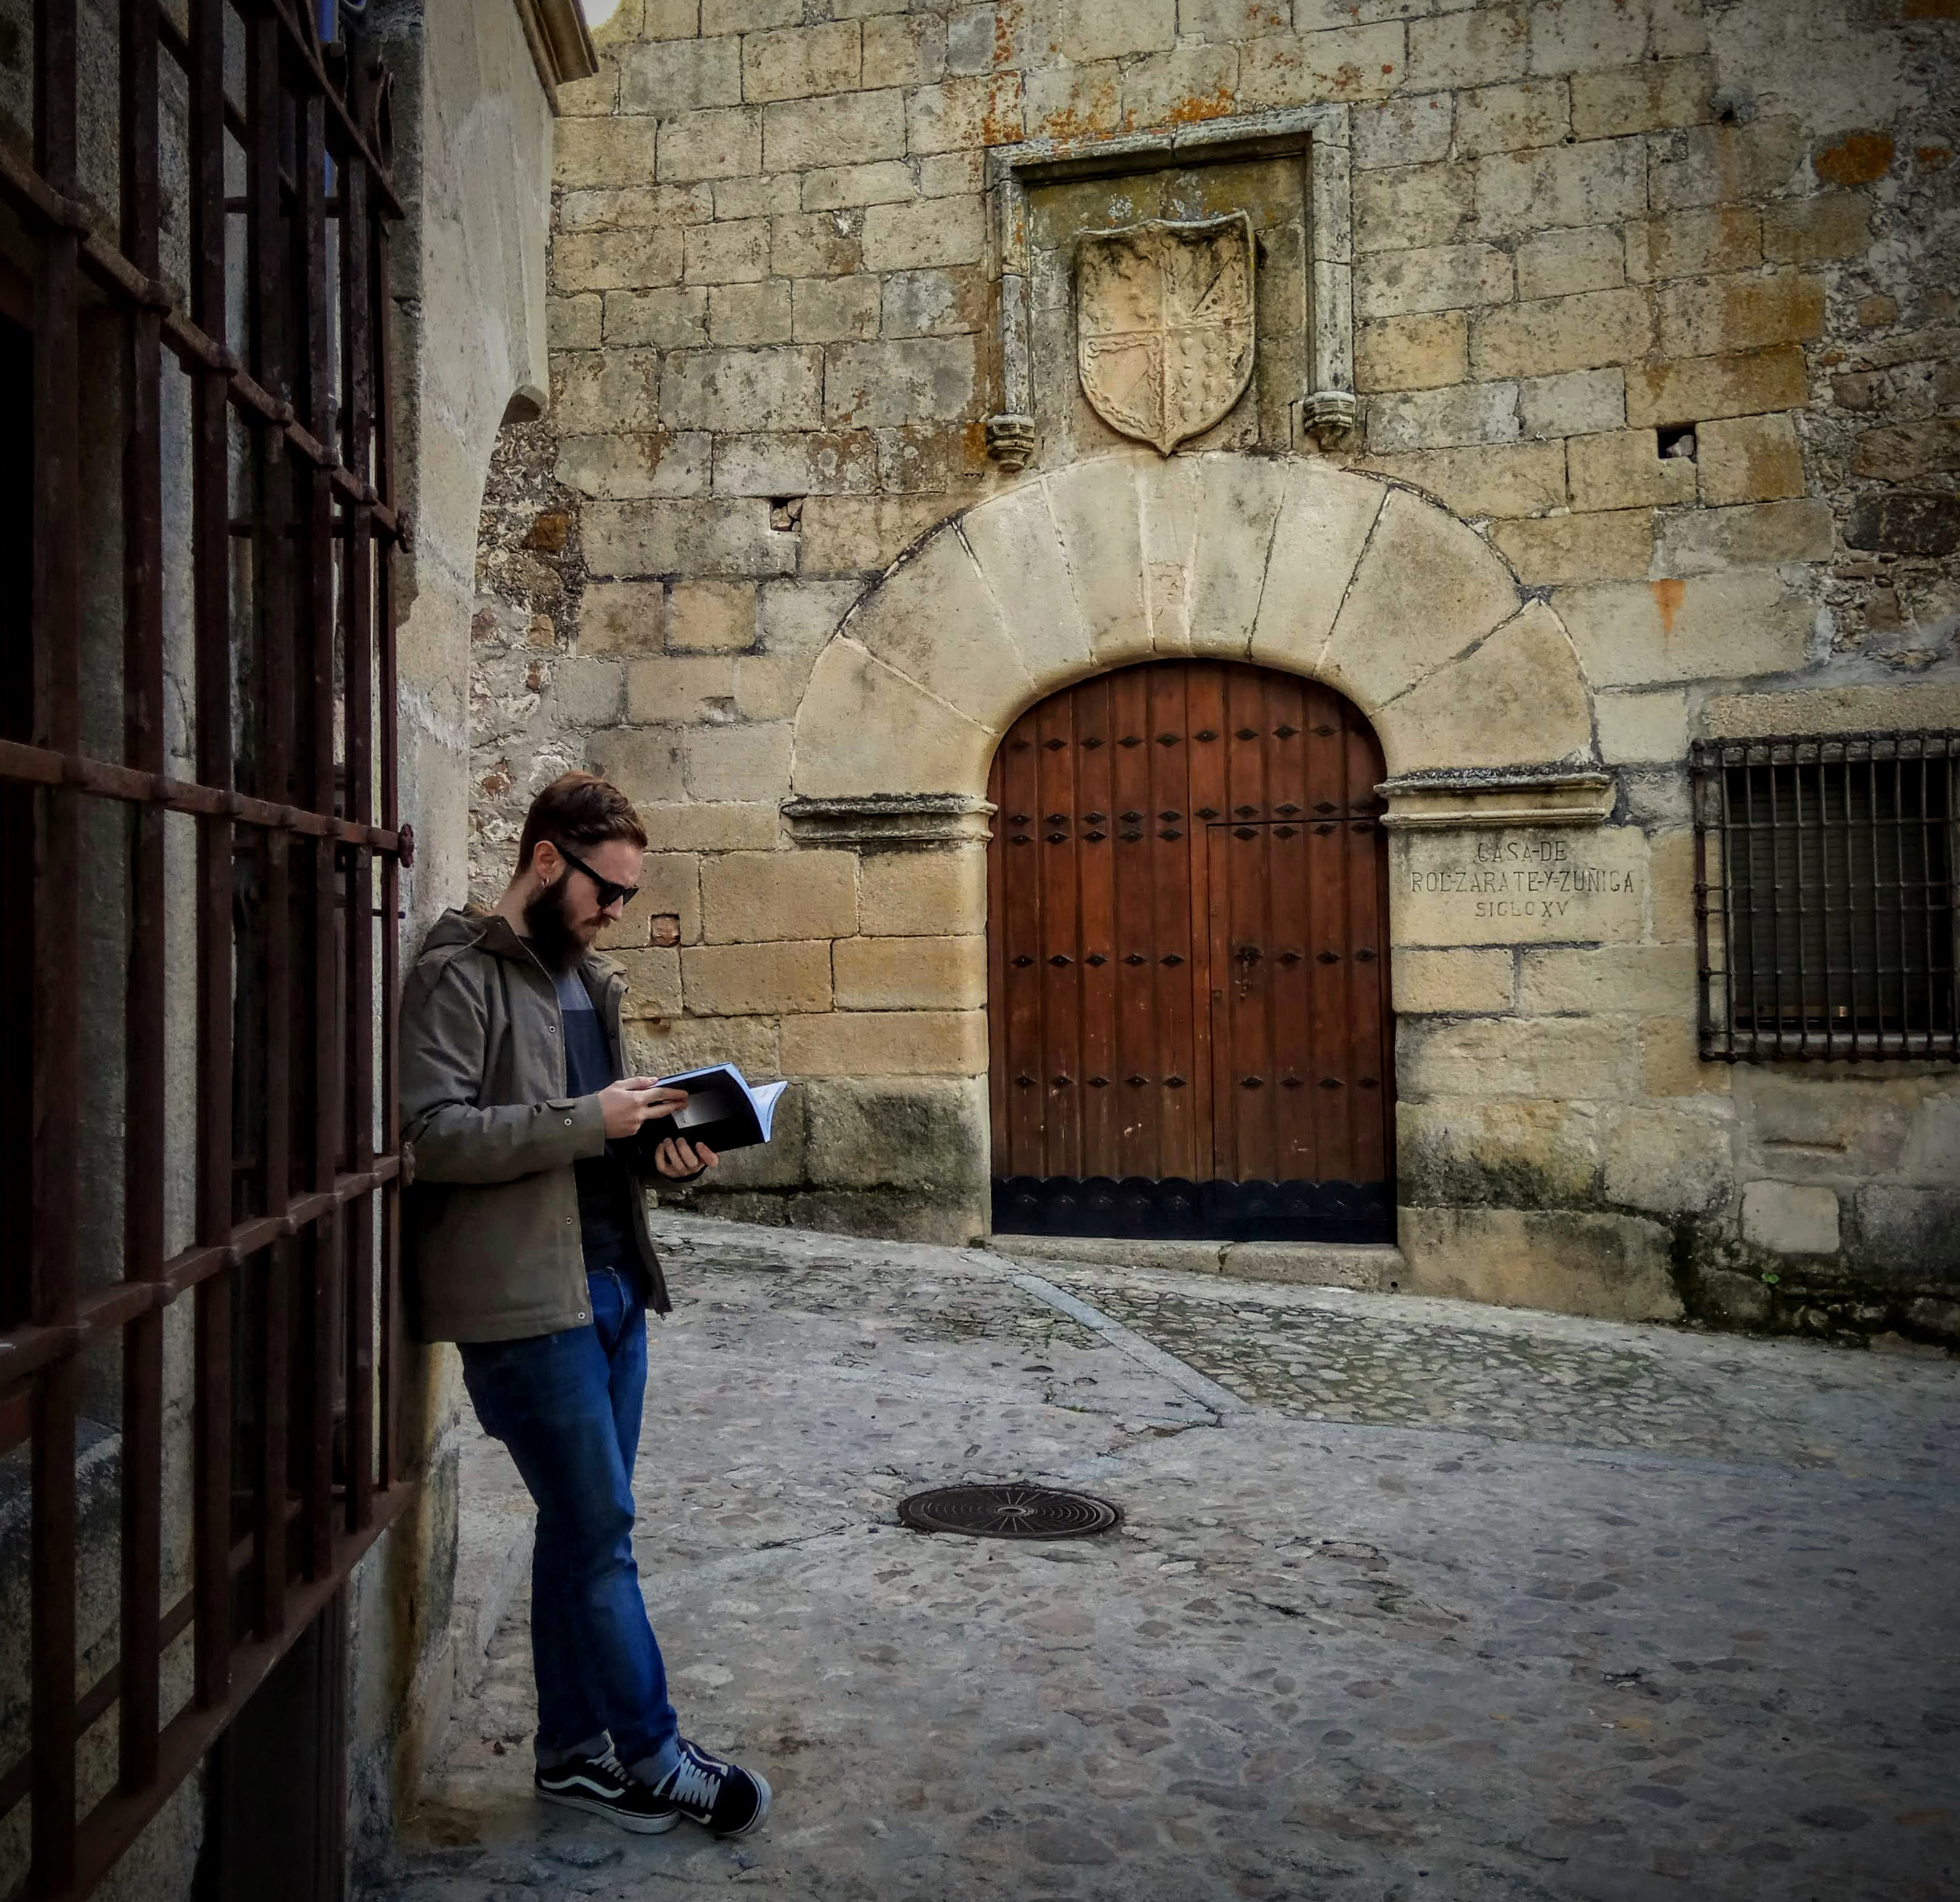 La Naturaleza se abre camino. VIII Encuentro de Bloggers de Extremadura